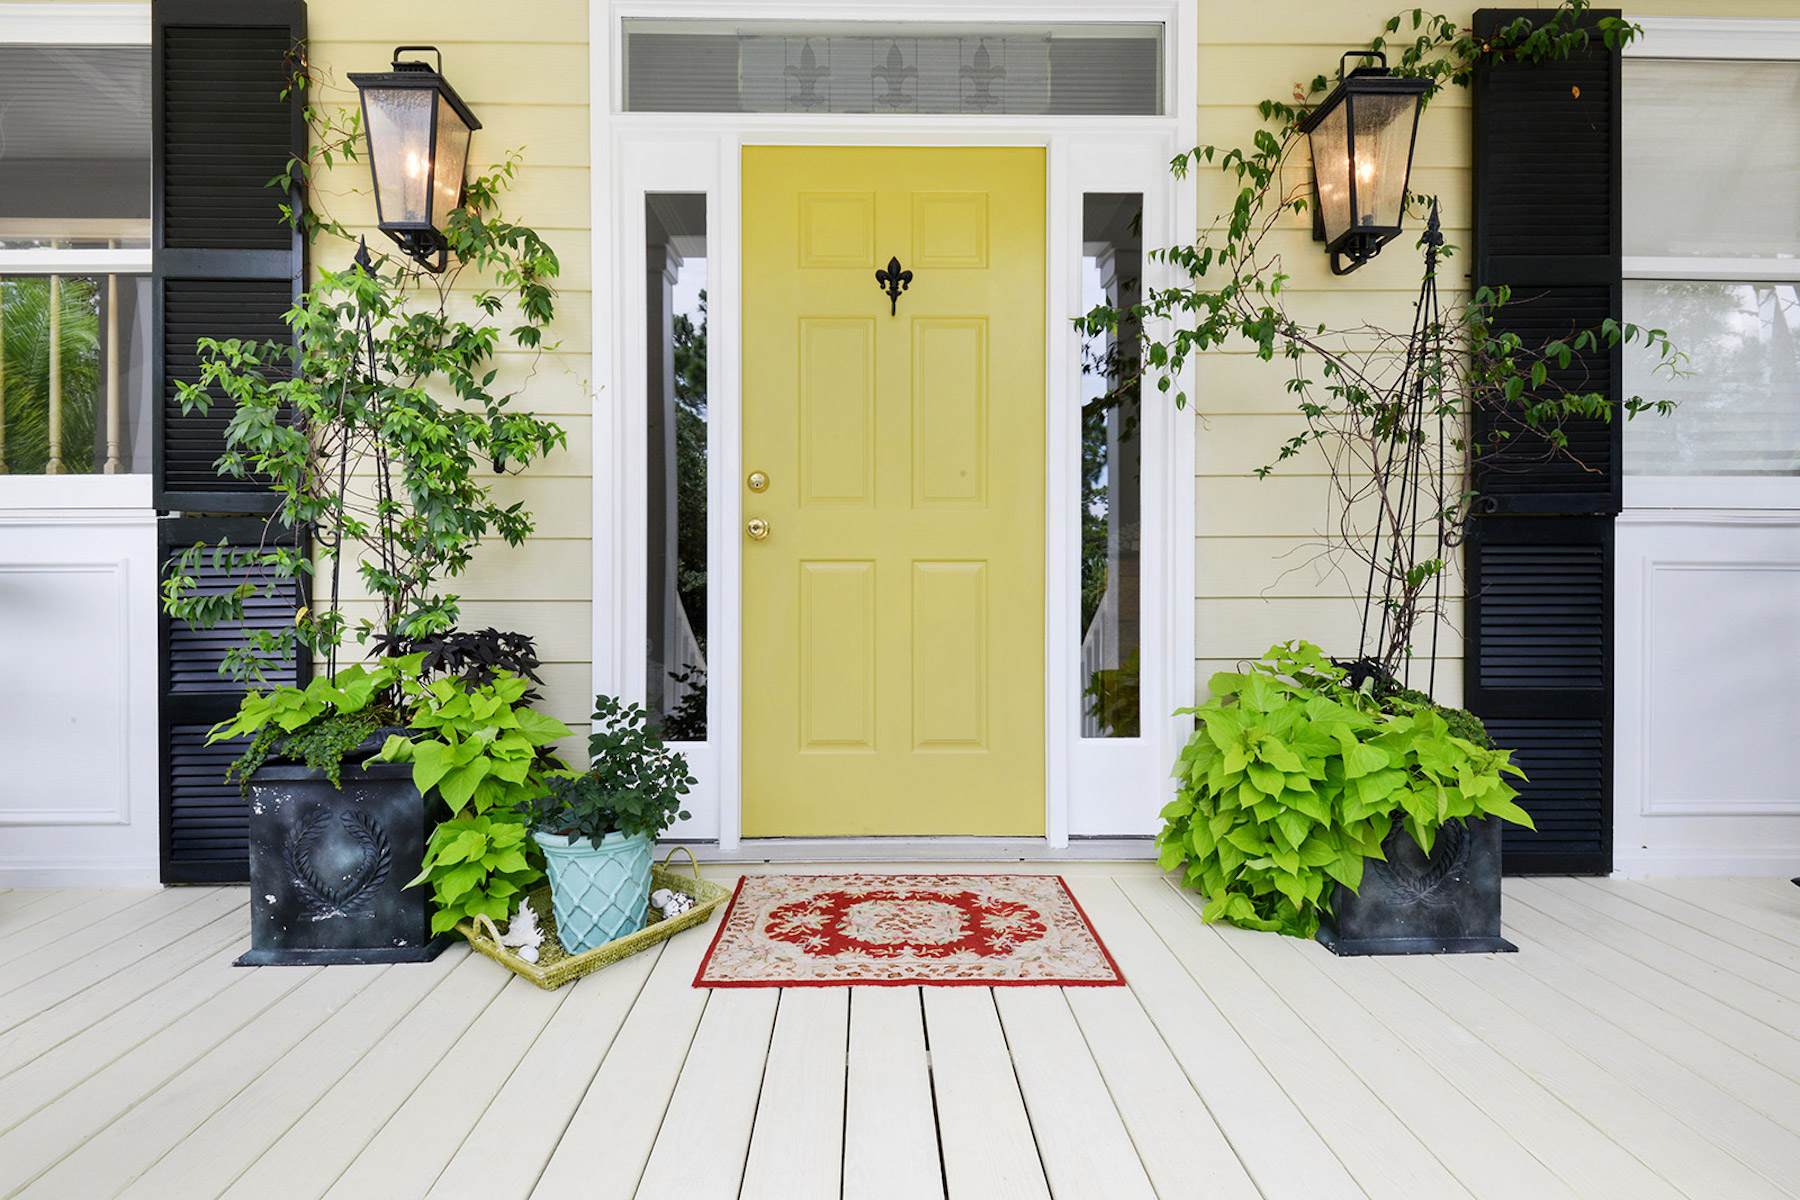 独户住宅 为 销售 在 Delightful Creole style home on Ono Harbour 30990 Peninsula Dr. Orange Beach, 阿拉巴马州, 36561 美国